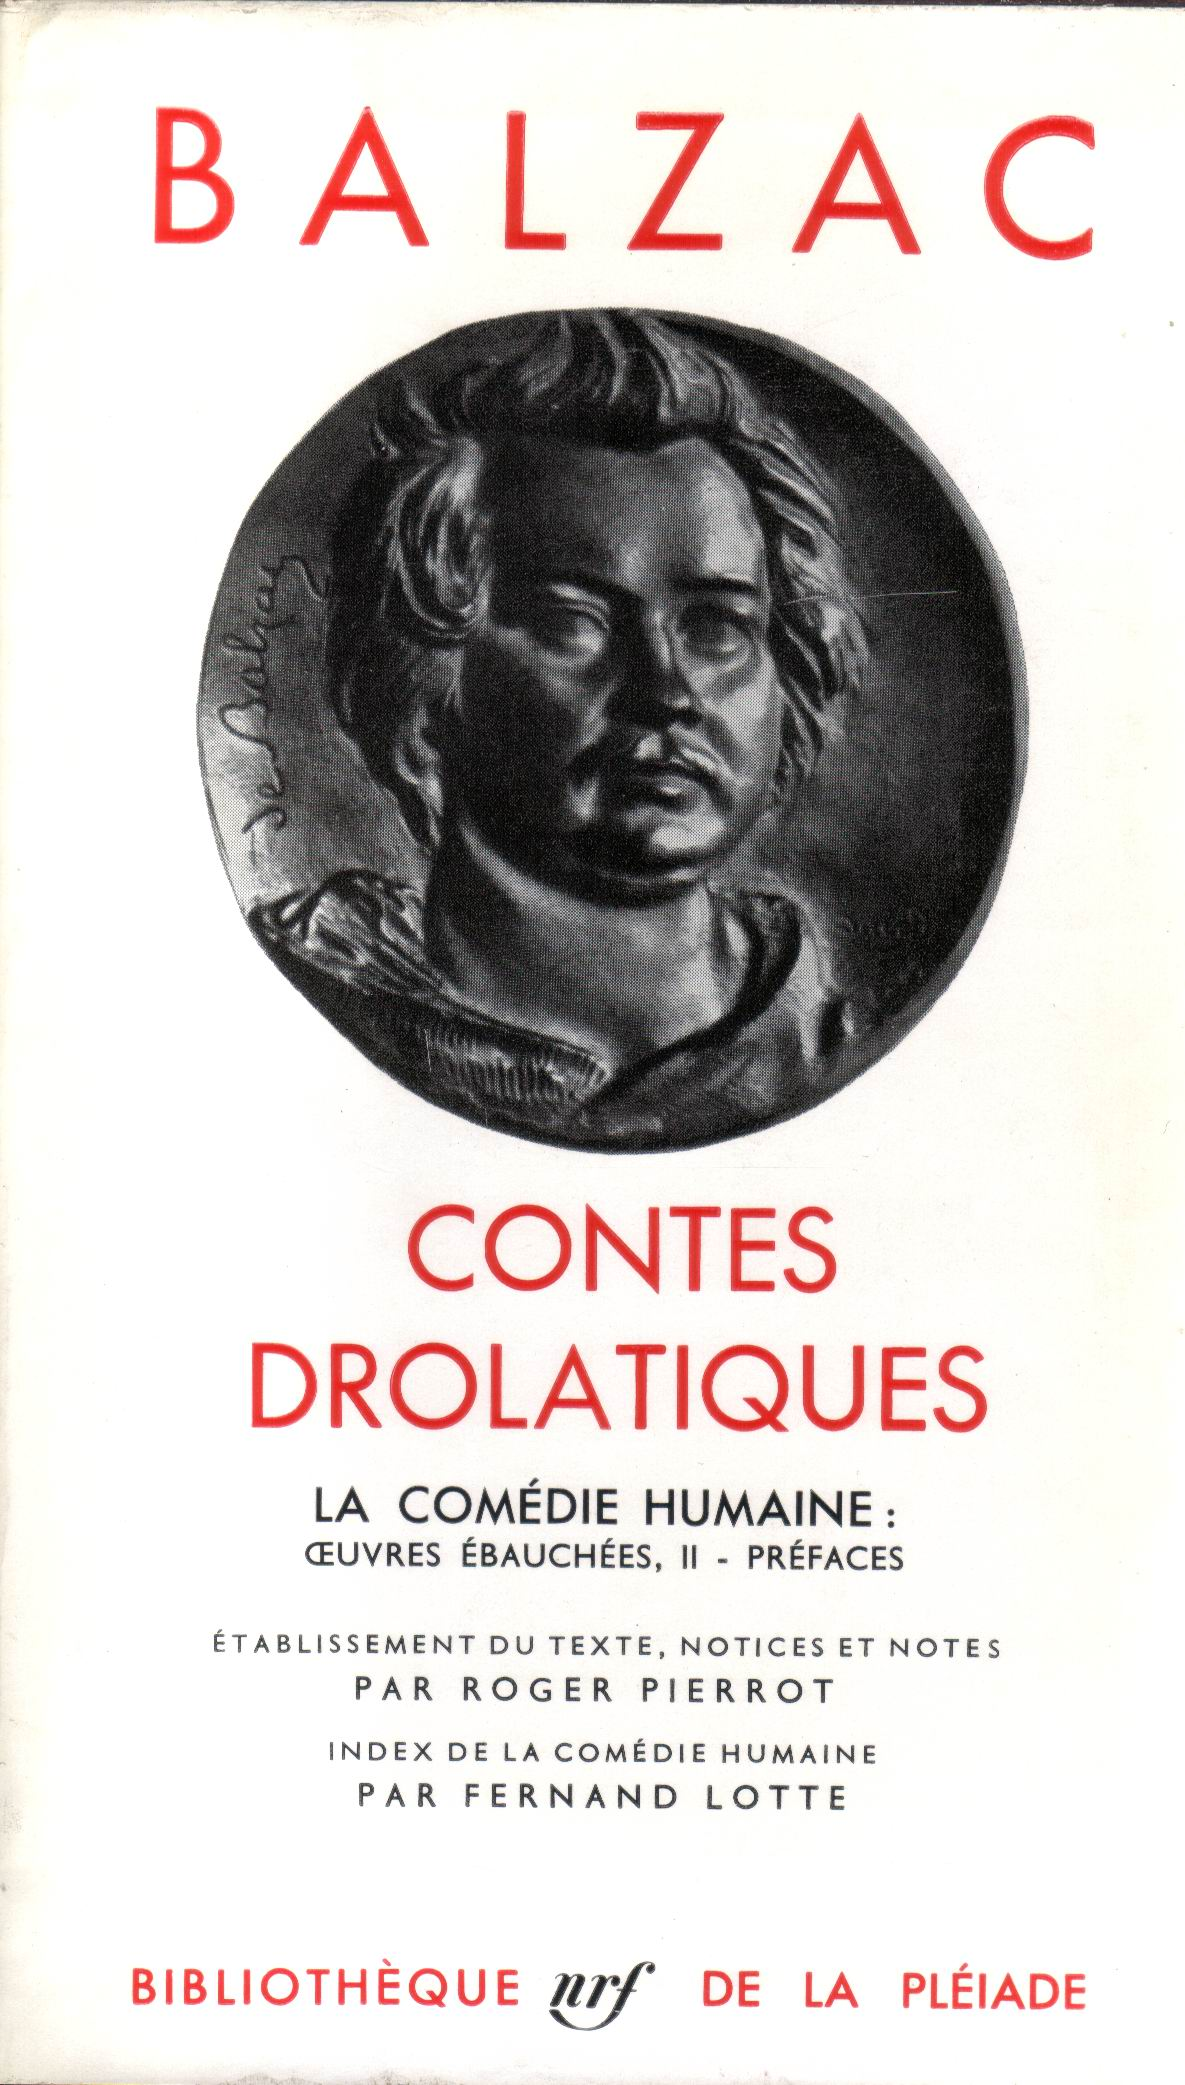 La Comedie humaine, ...